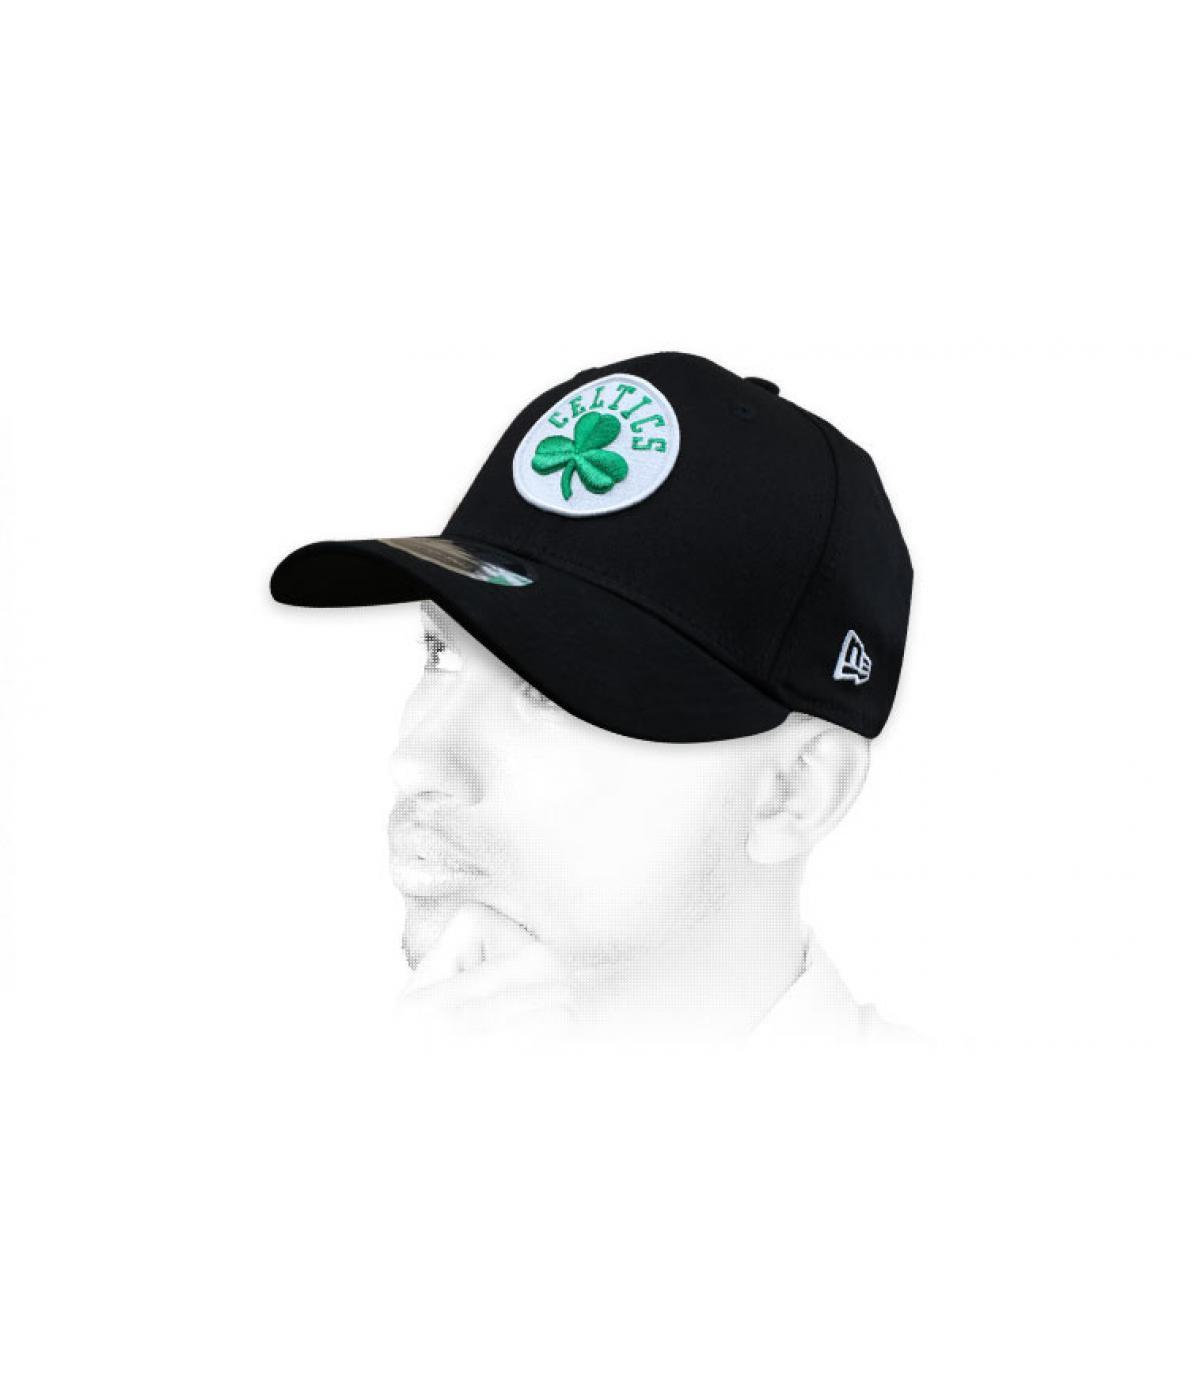 Cappellino Celtics nero